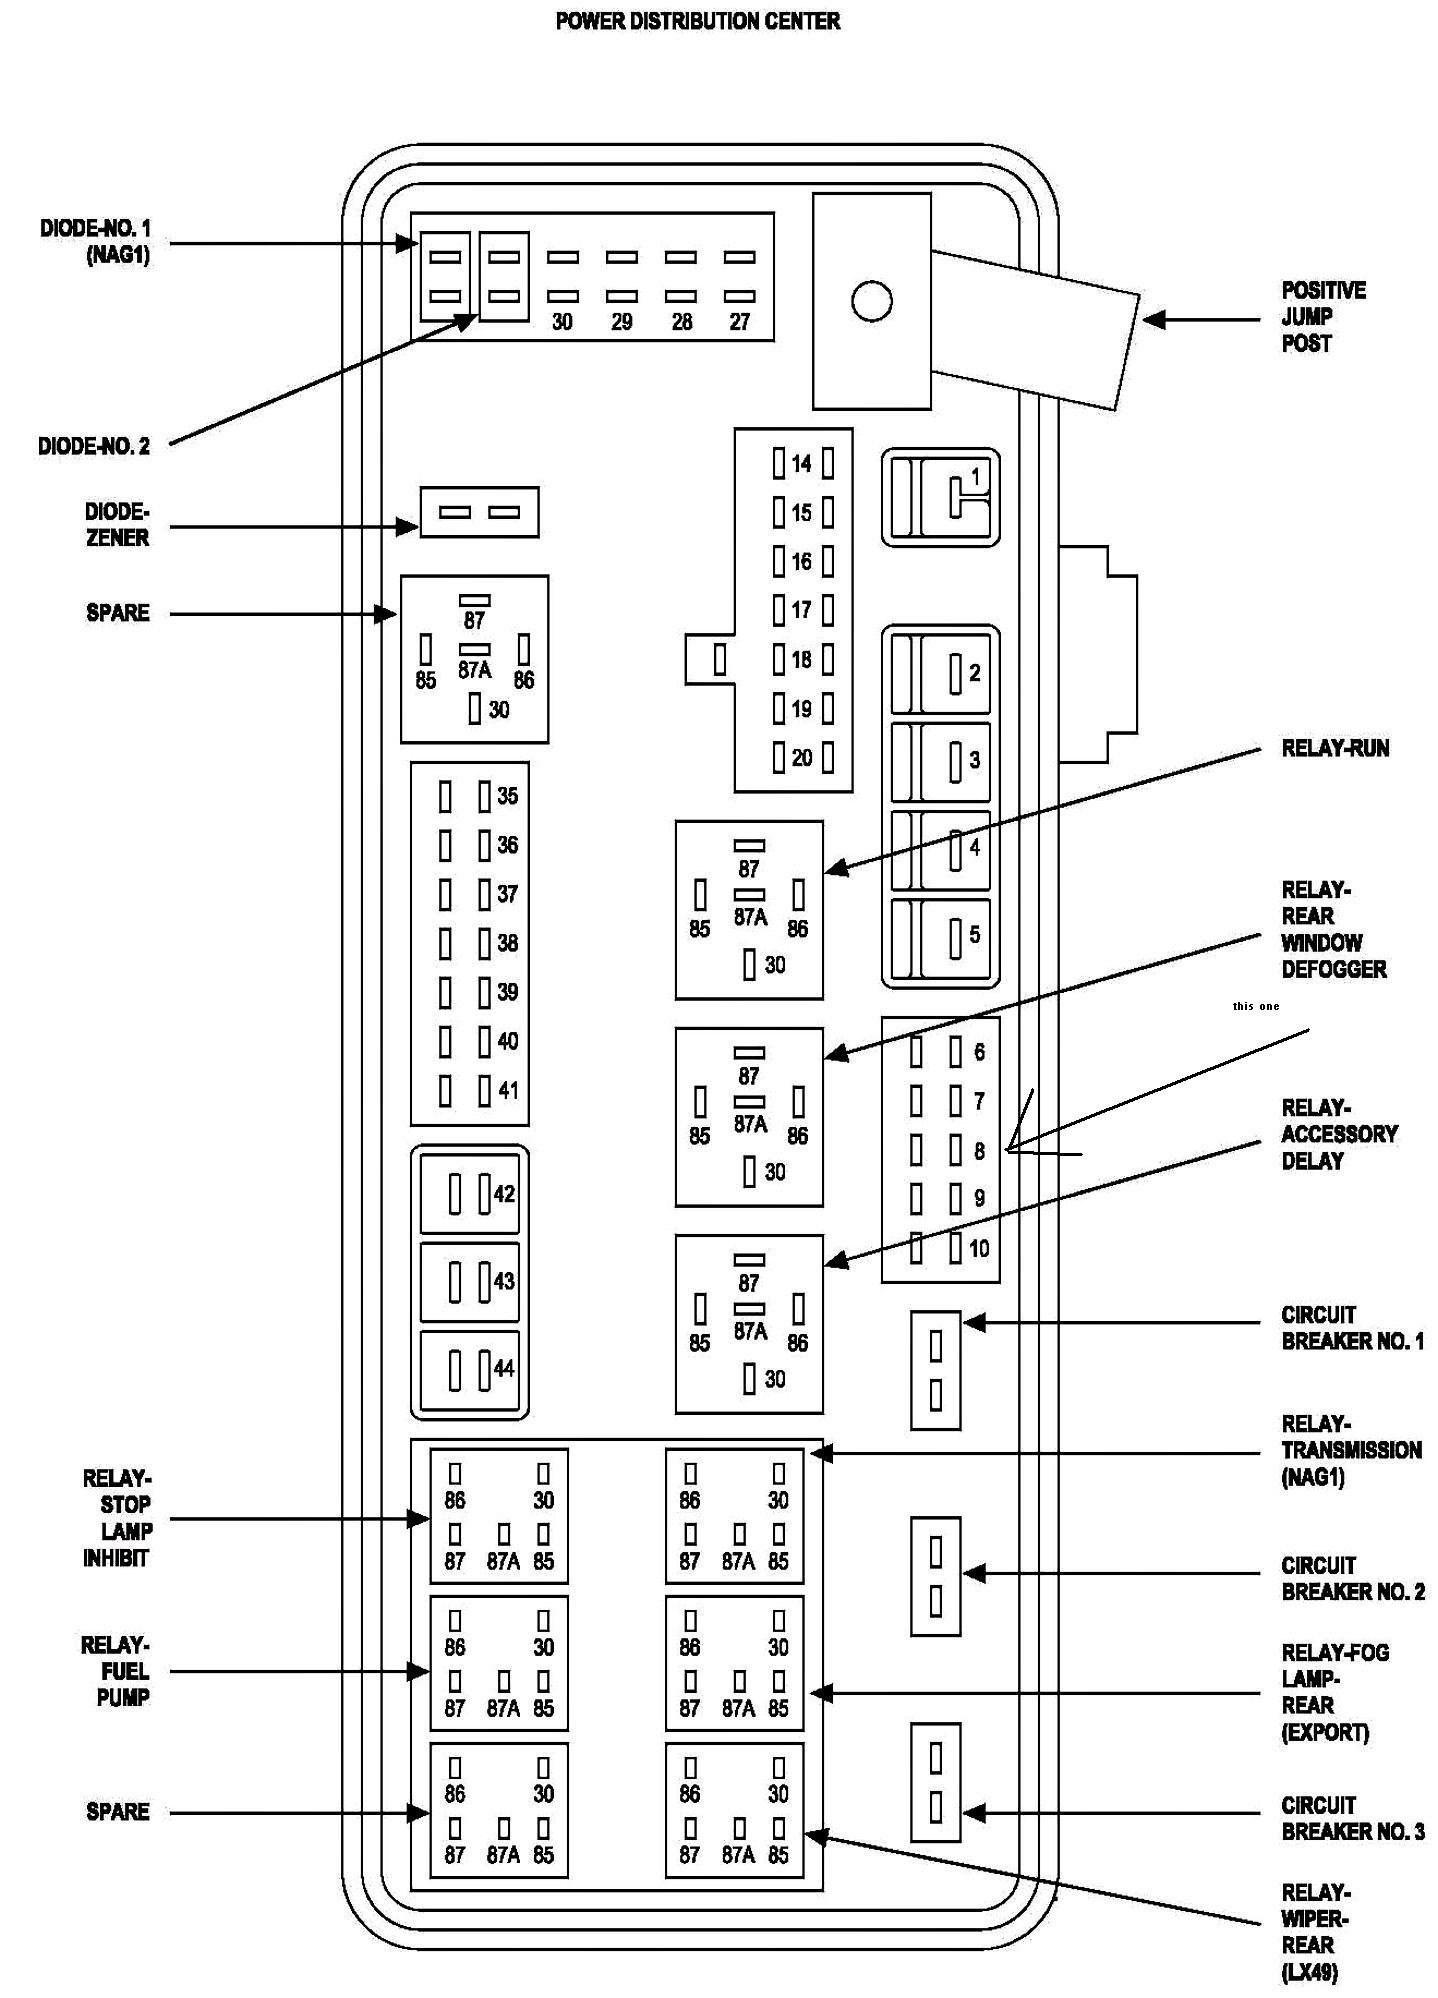 2006 Jeep Commander Fuse Box Diagram : 2002 Jeep Cherokee